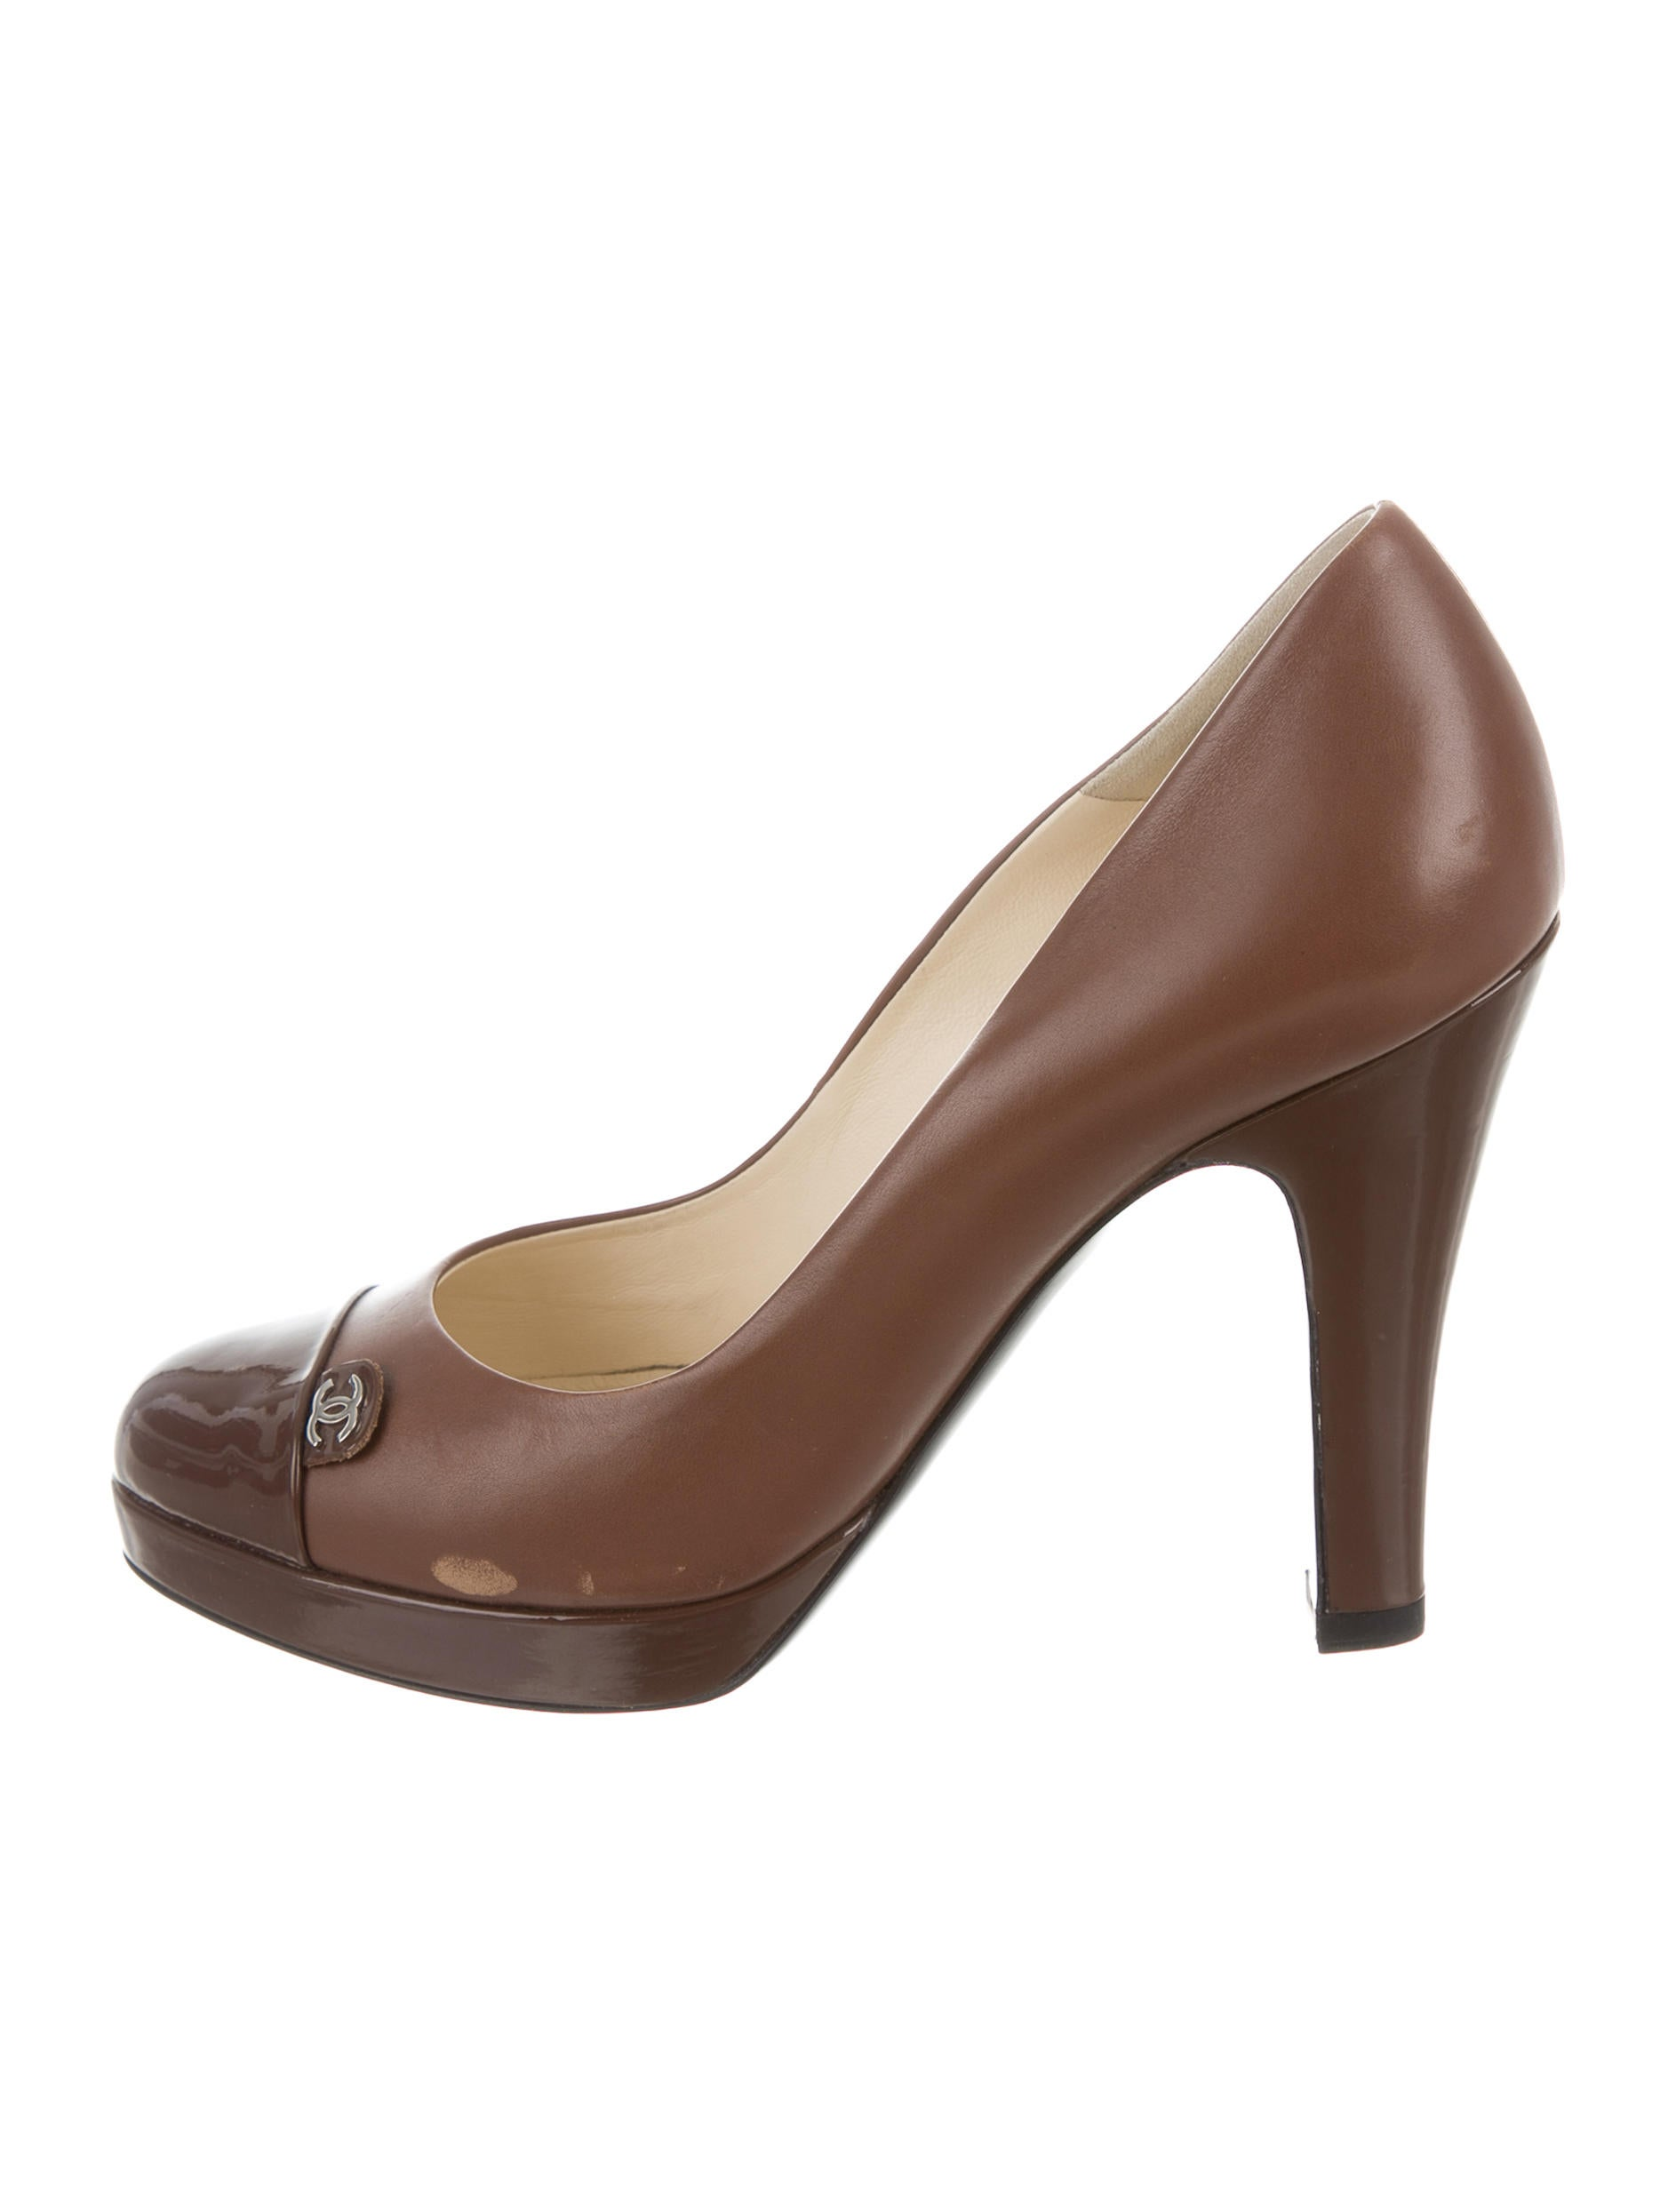 chanel platform cap toe pumps shoes cha157933 the